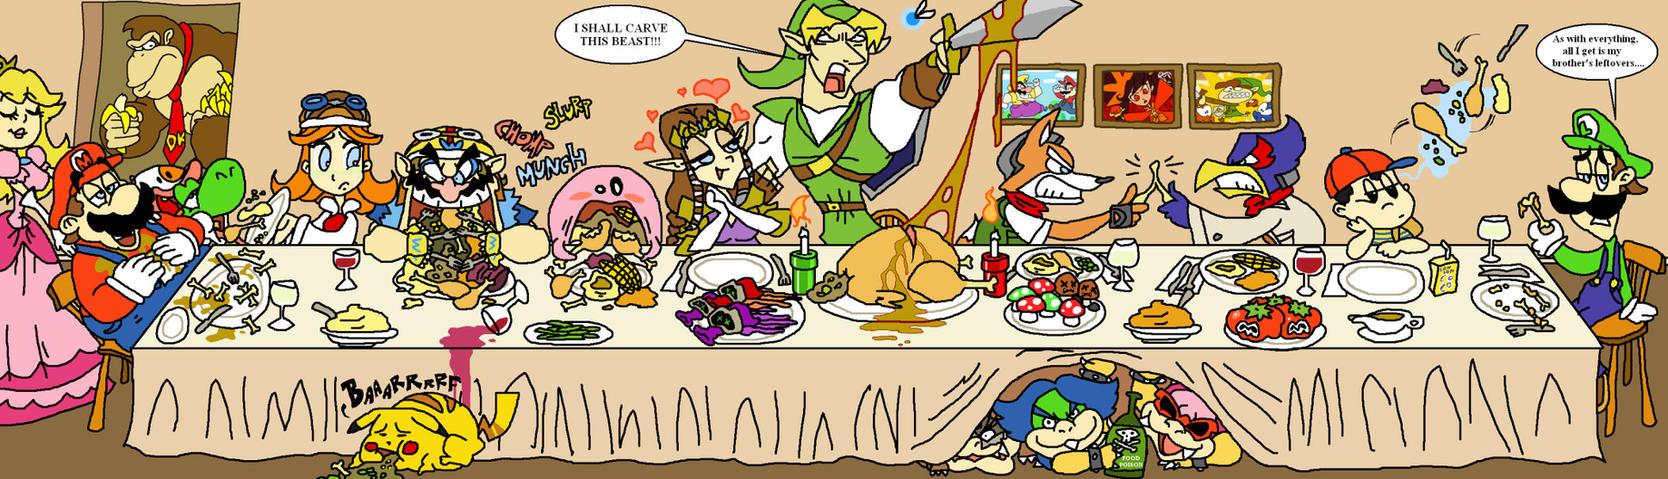 Thanksgiving with Nintendo by HoppyBadBunny